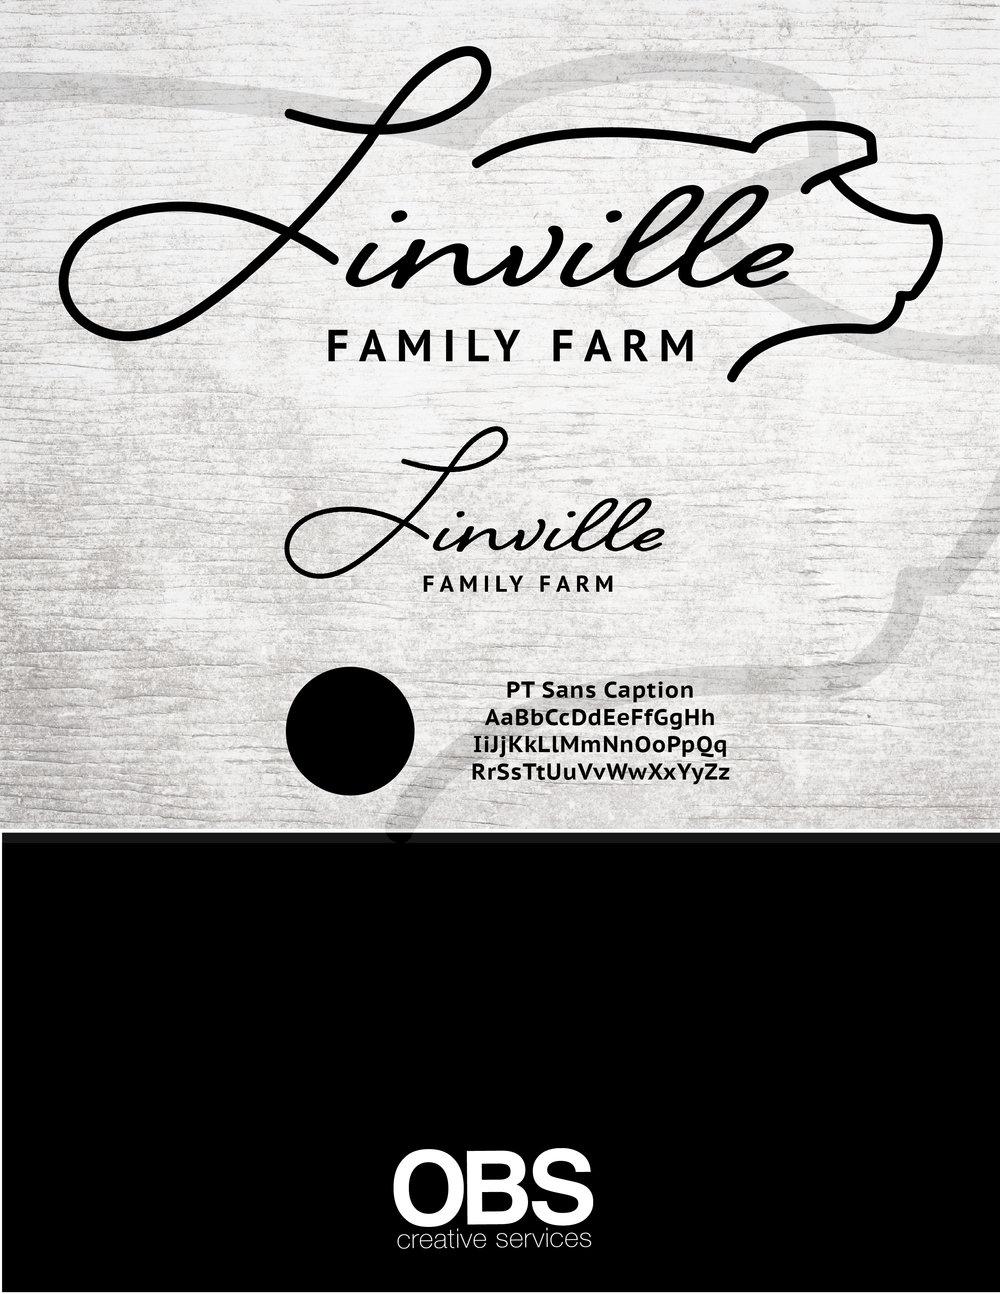 Linville Farm.jpg